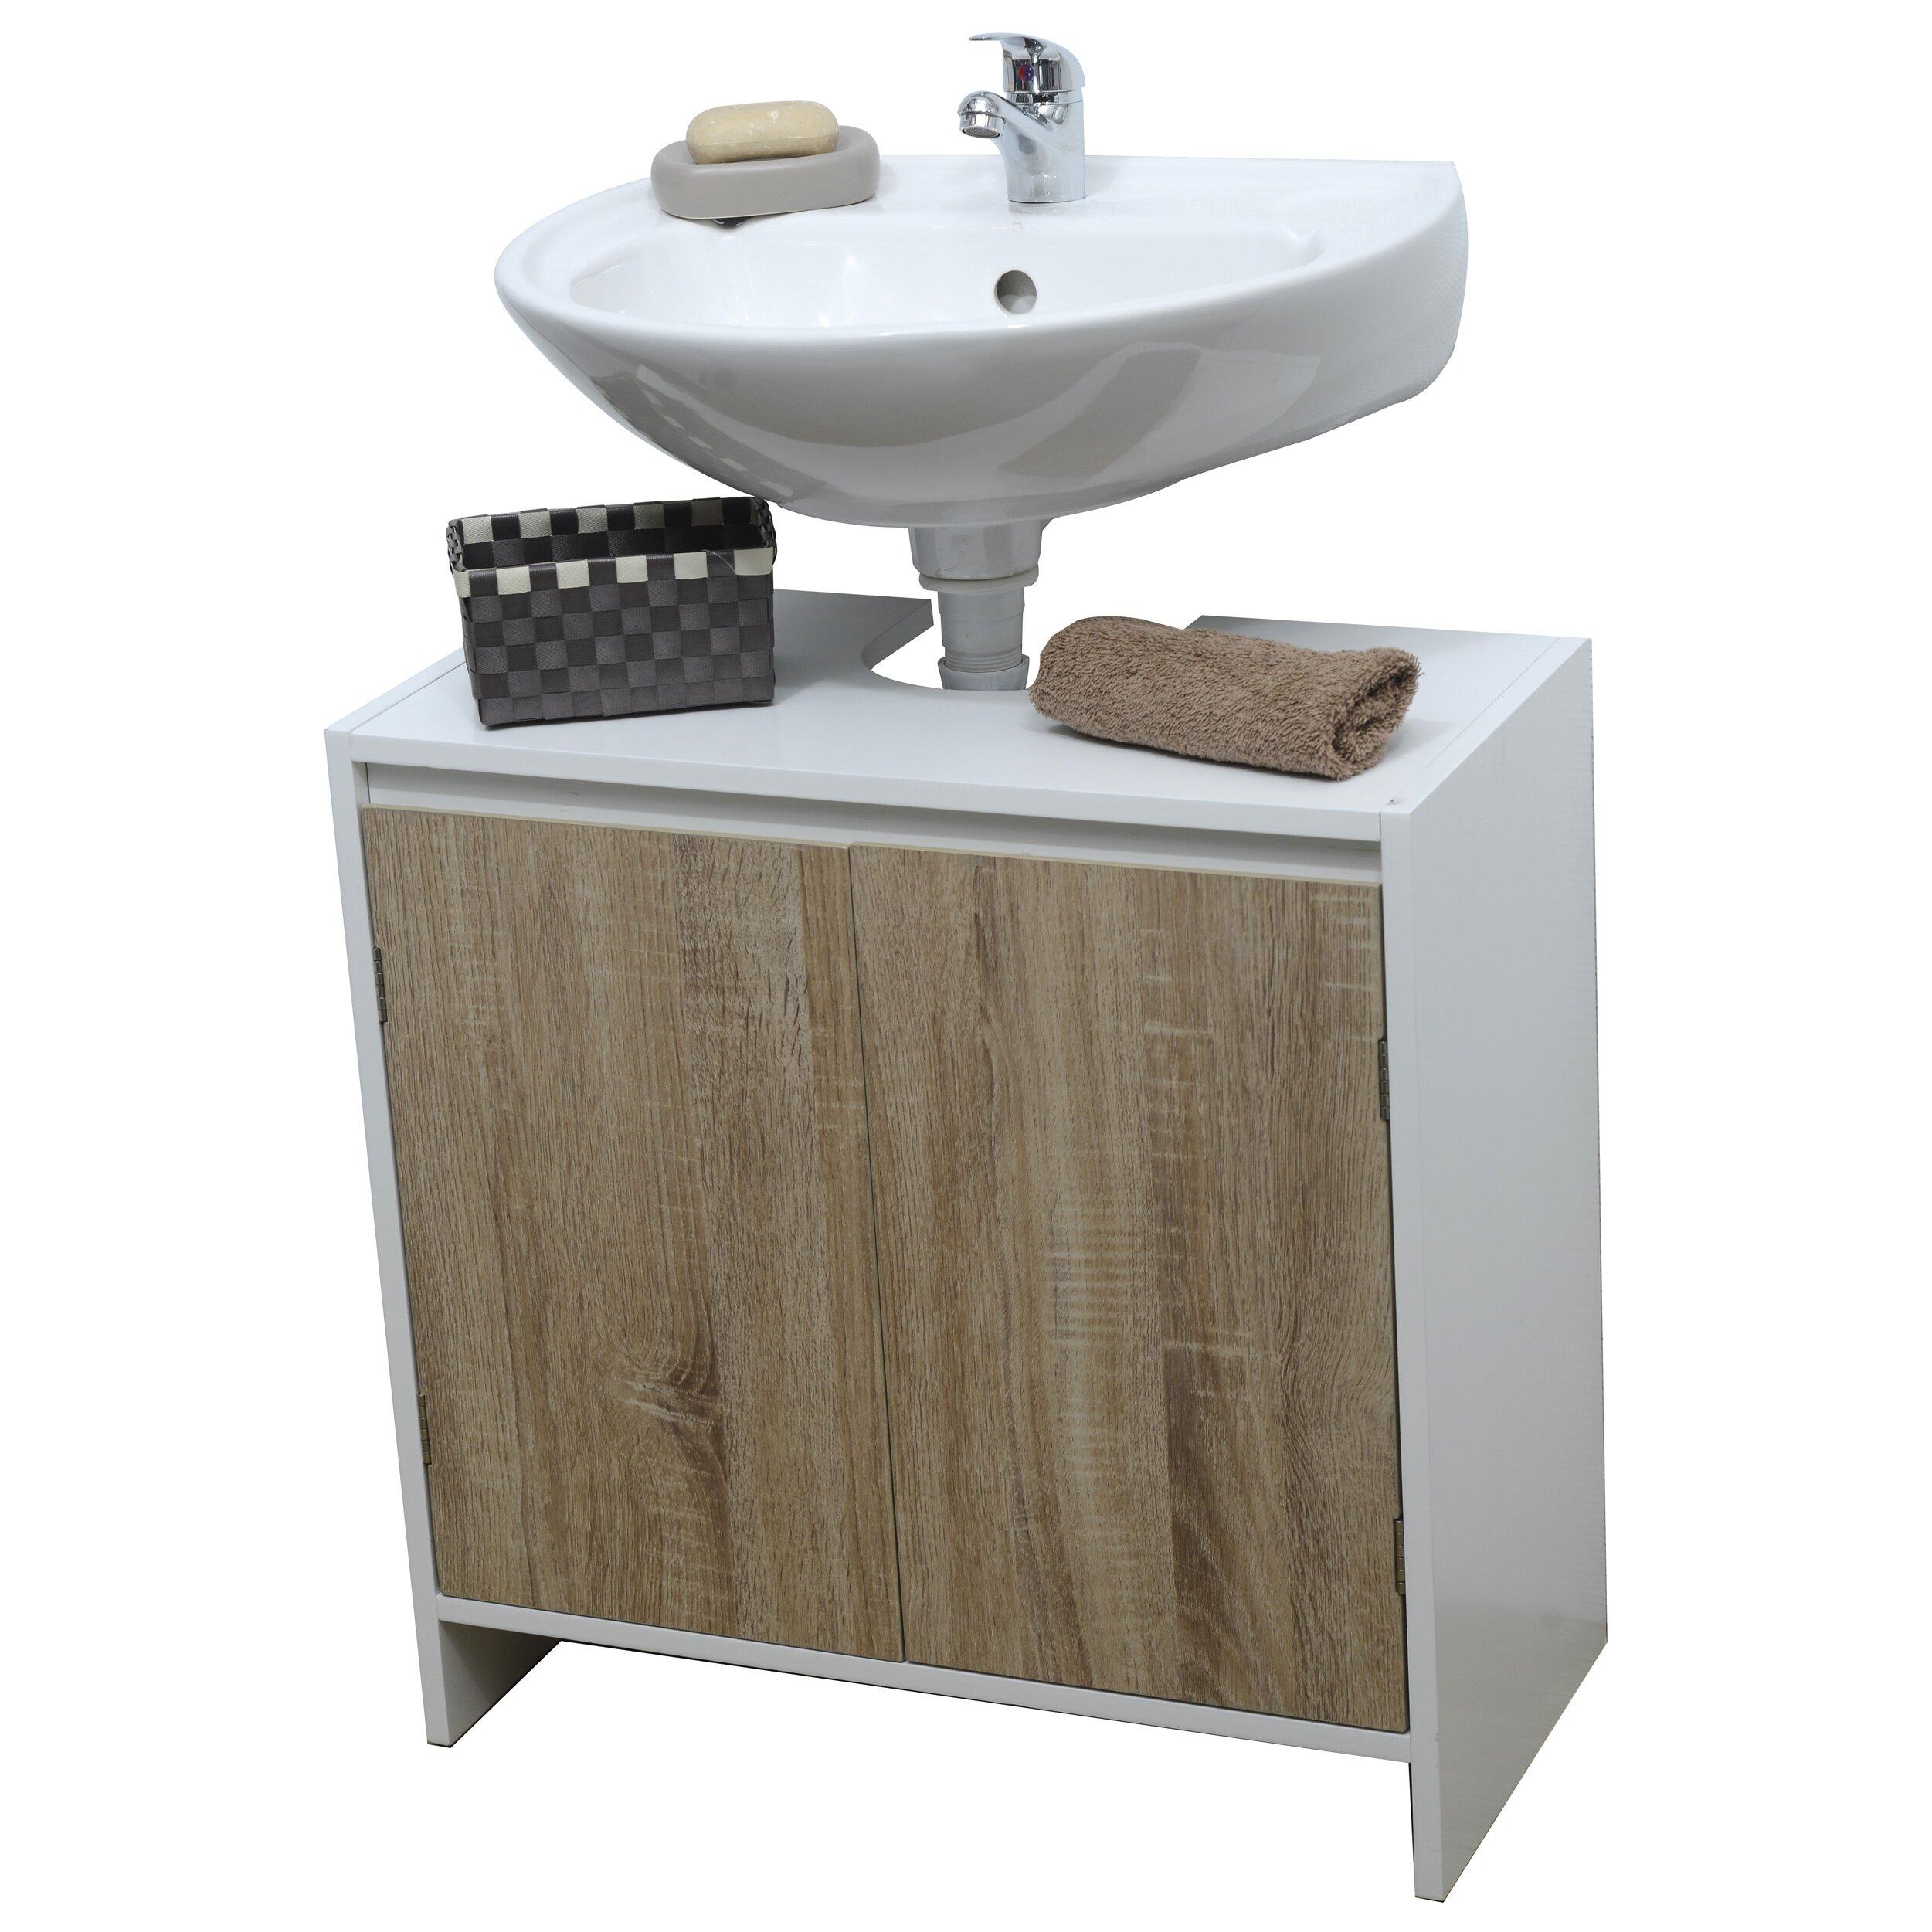 Creative Small Bathroom Vanities Traditional Bathroom Vanities And Sink Good